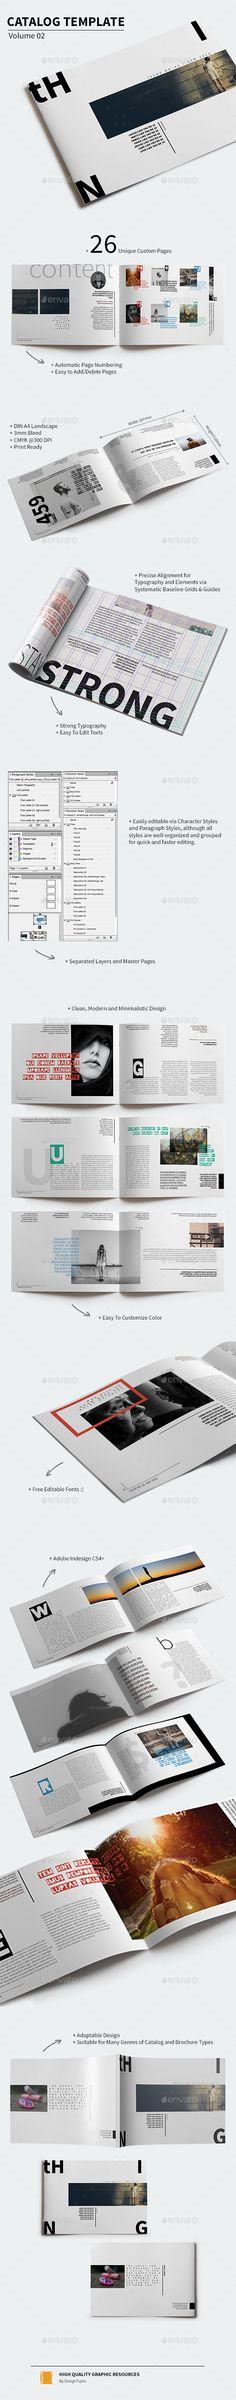 Catalog Brochure Template #design                                                                                                                                                                                 More